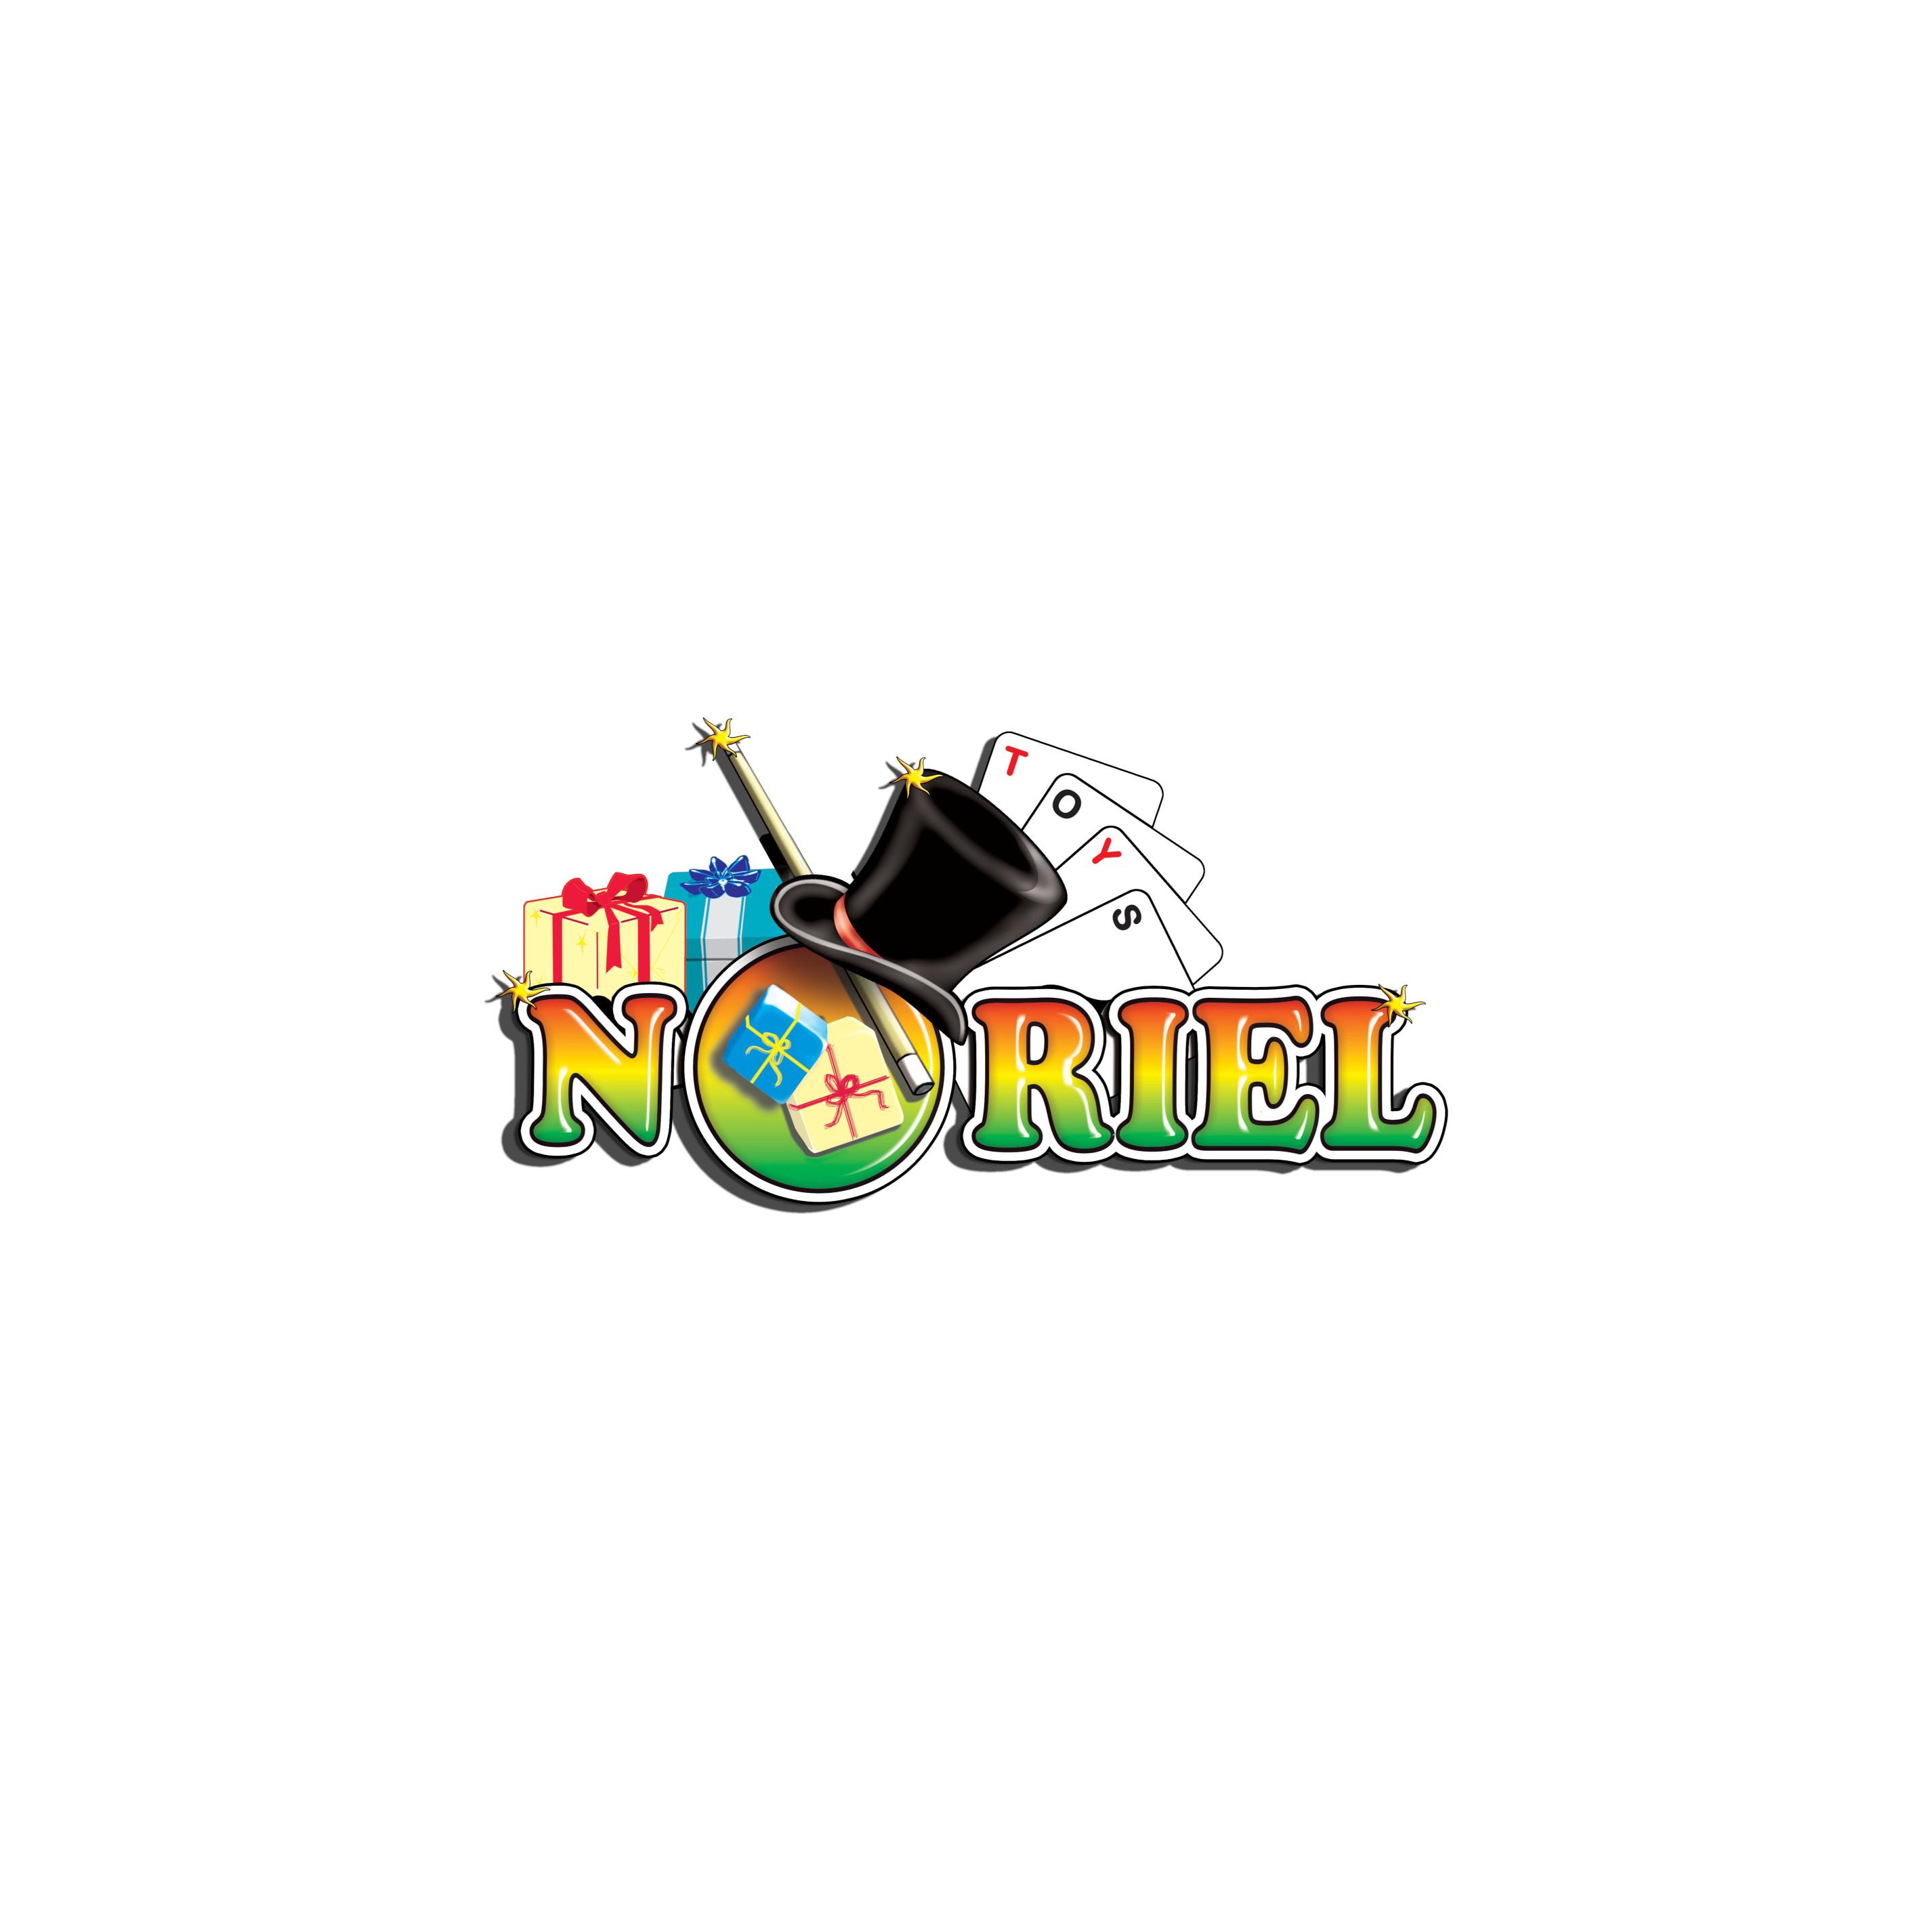 Minions - Frisbee